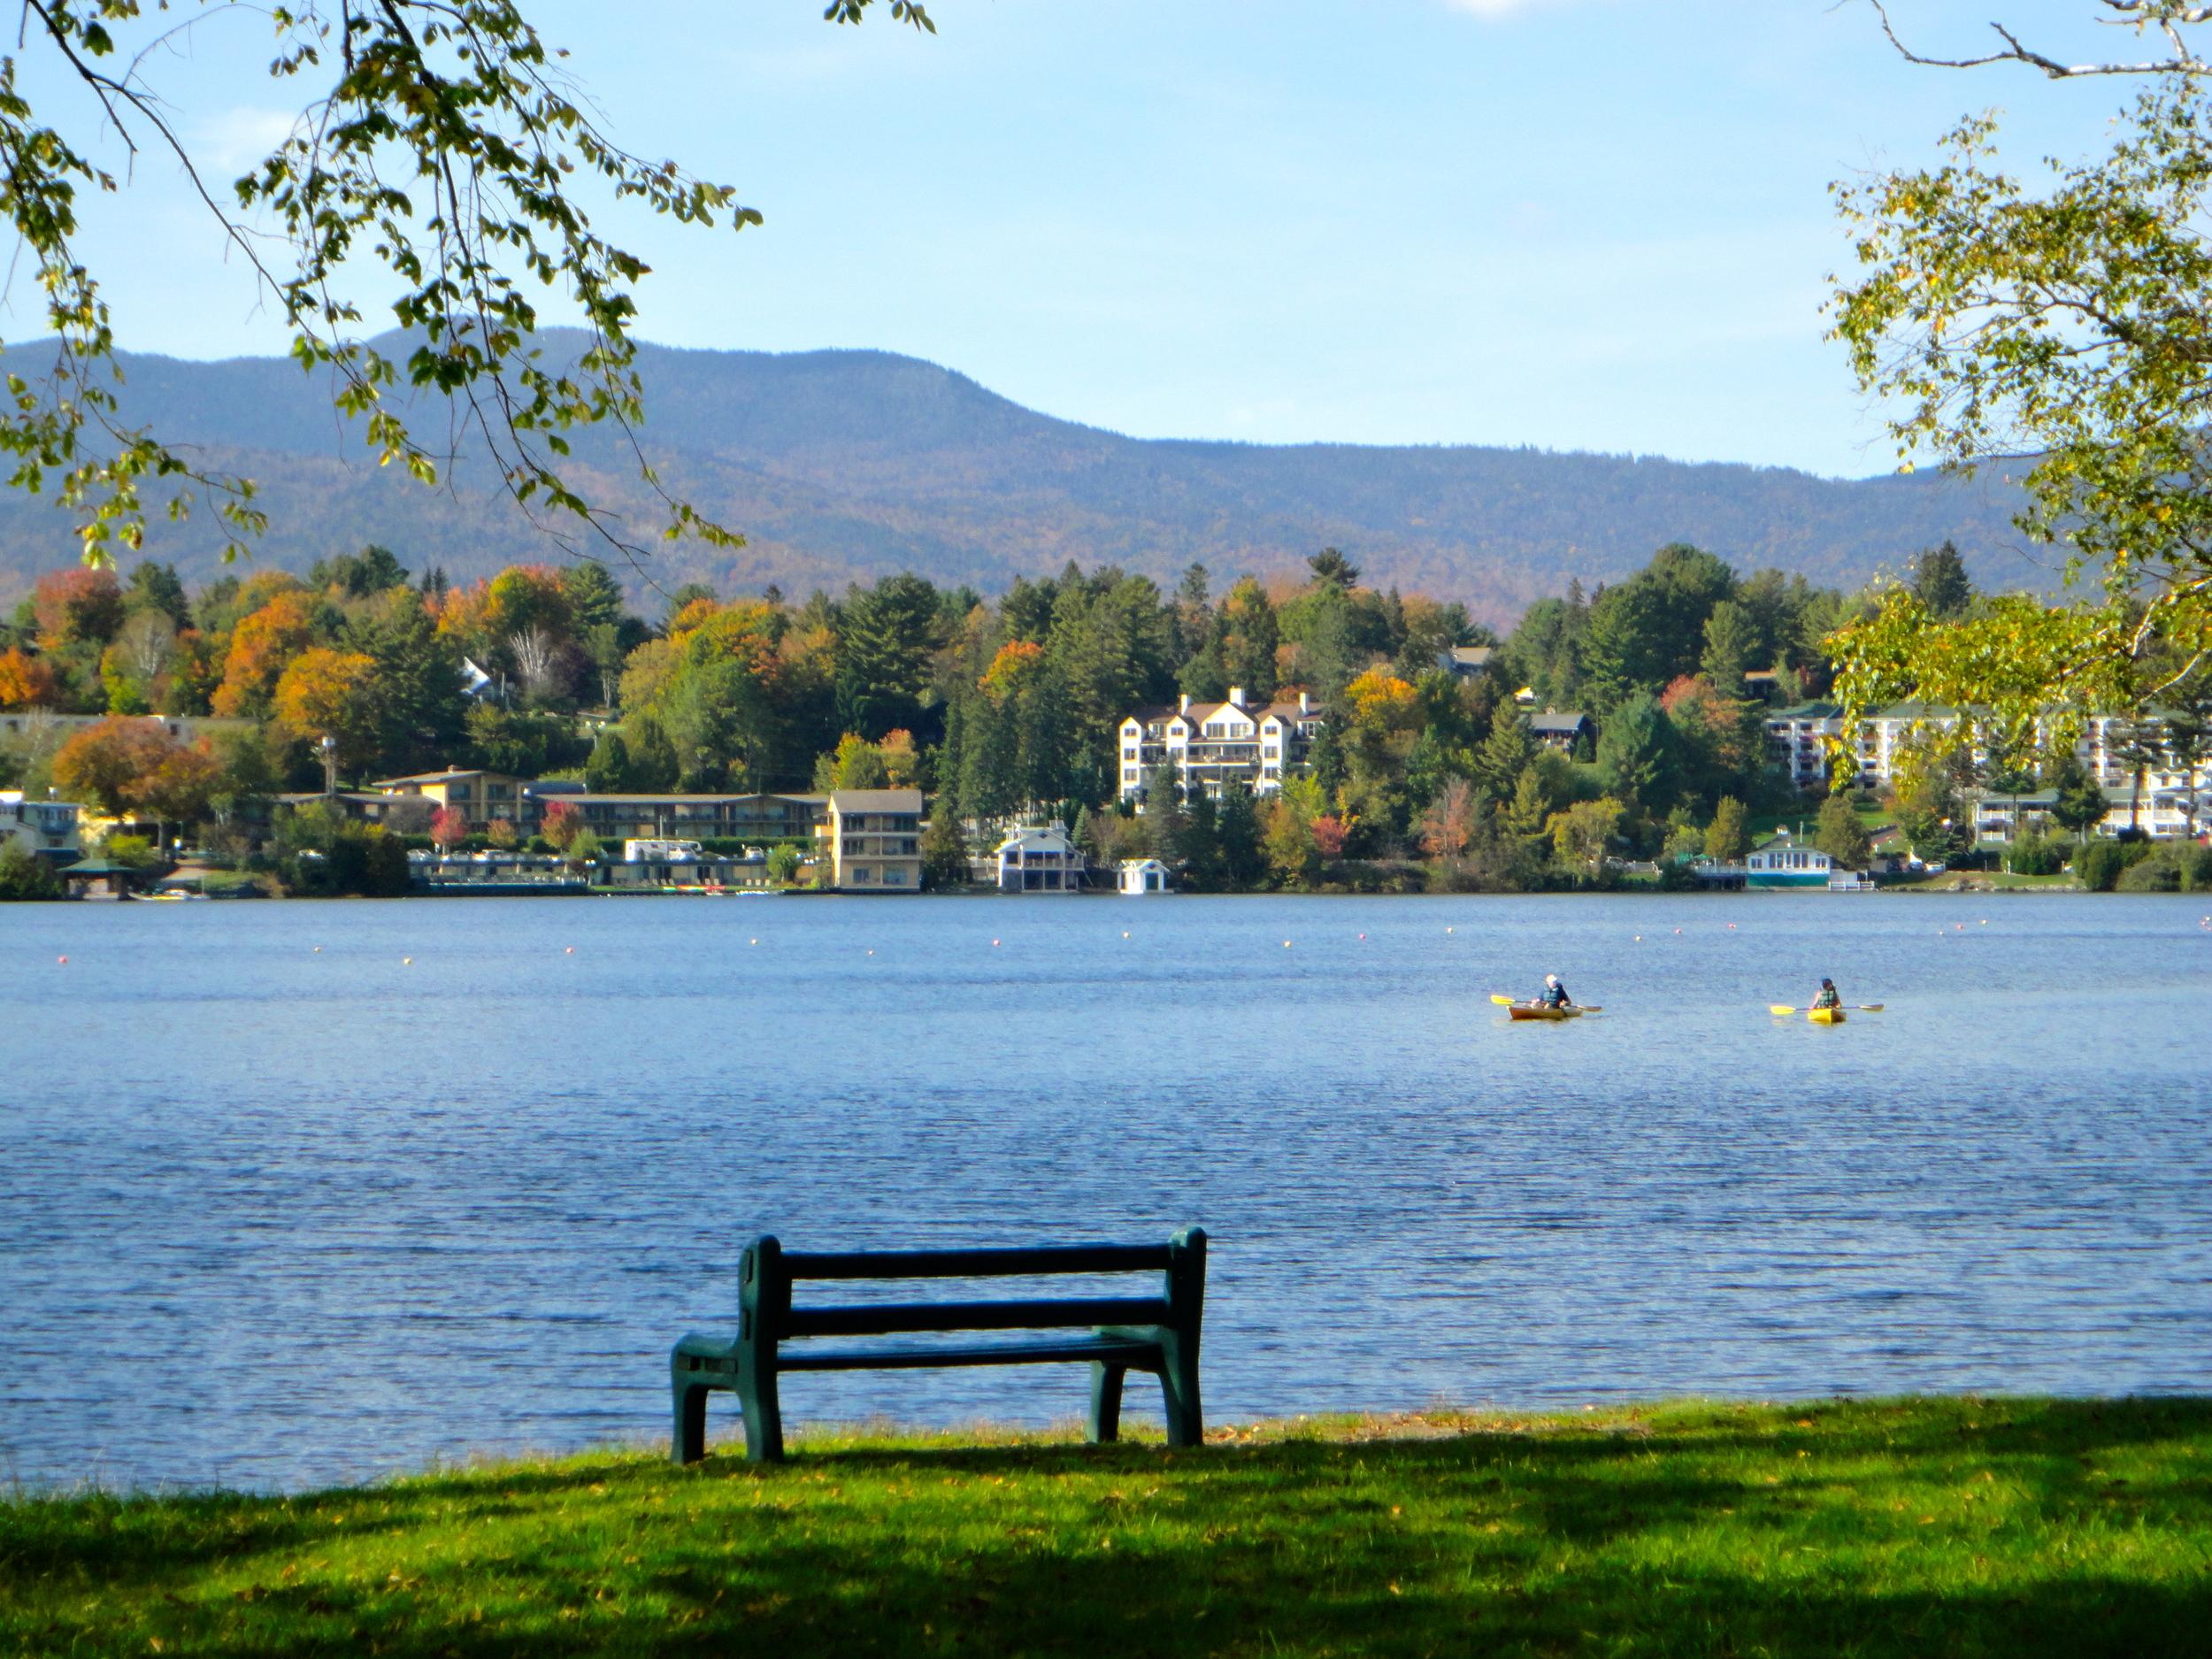 Popular lawn area on Mirror Lake